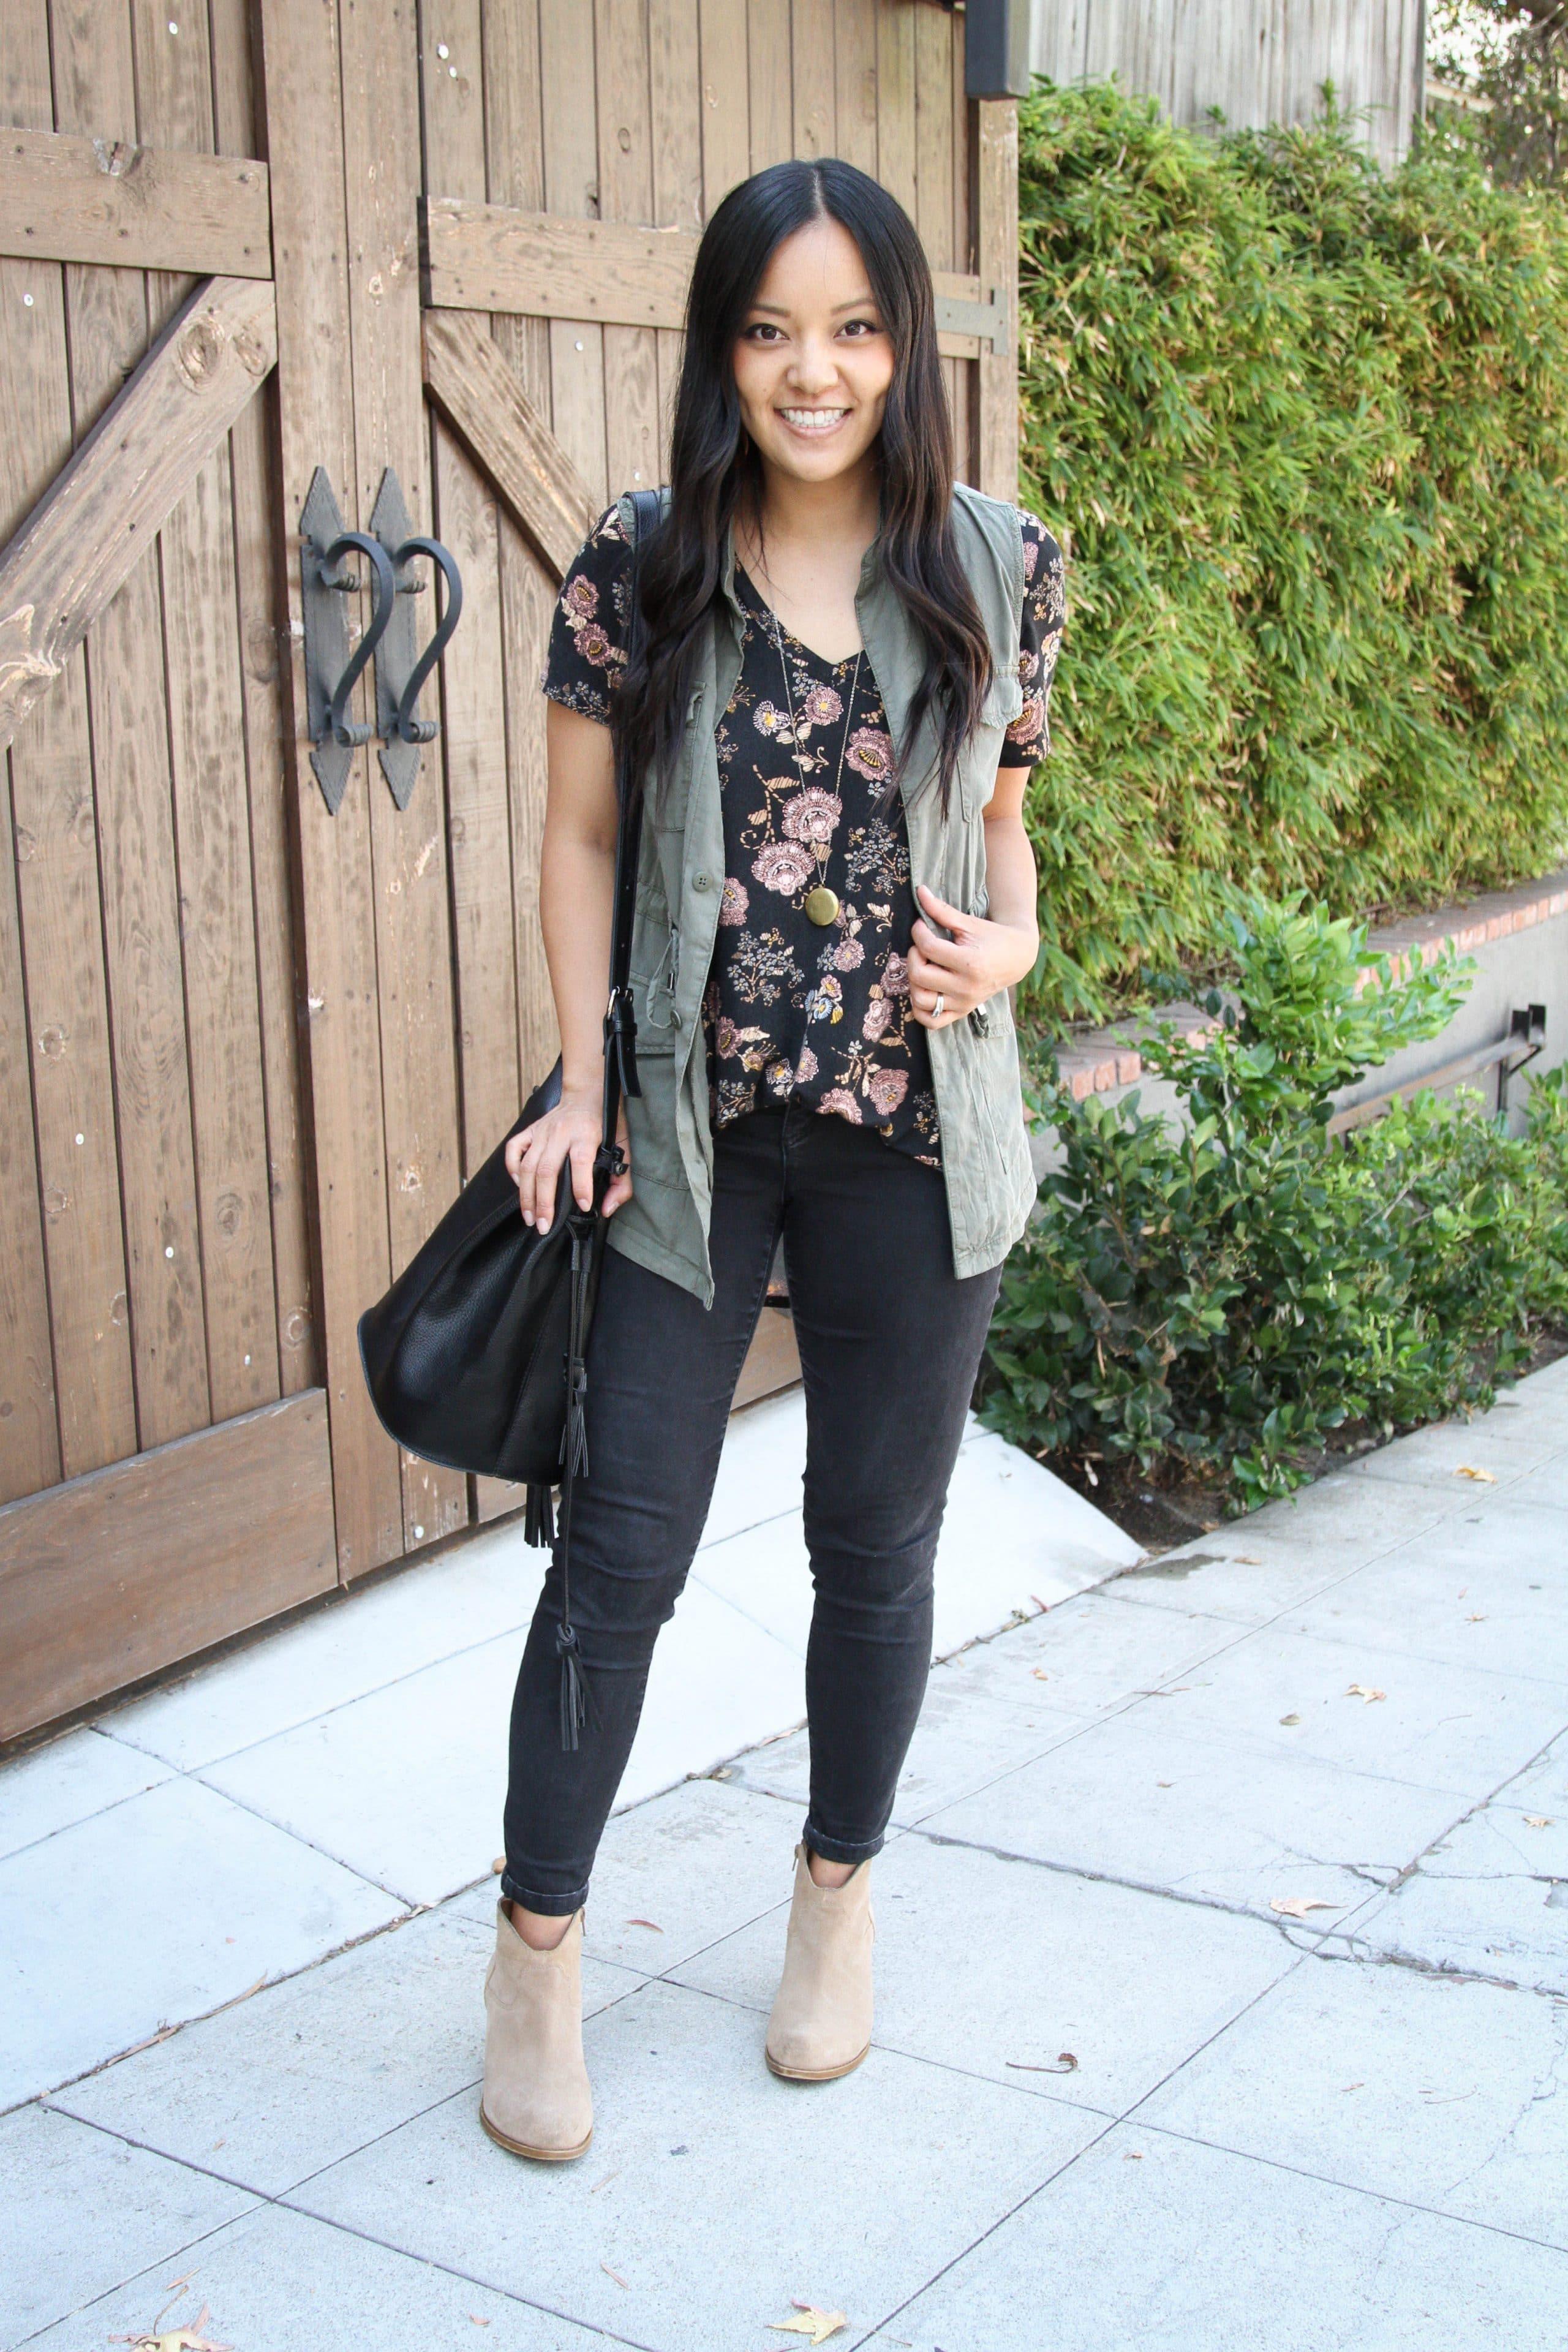 Black floral top + Utility Vest + Black Jeans + Taupe Booties + black bag